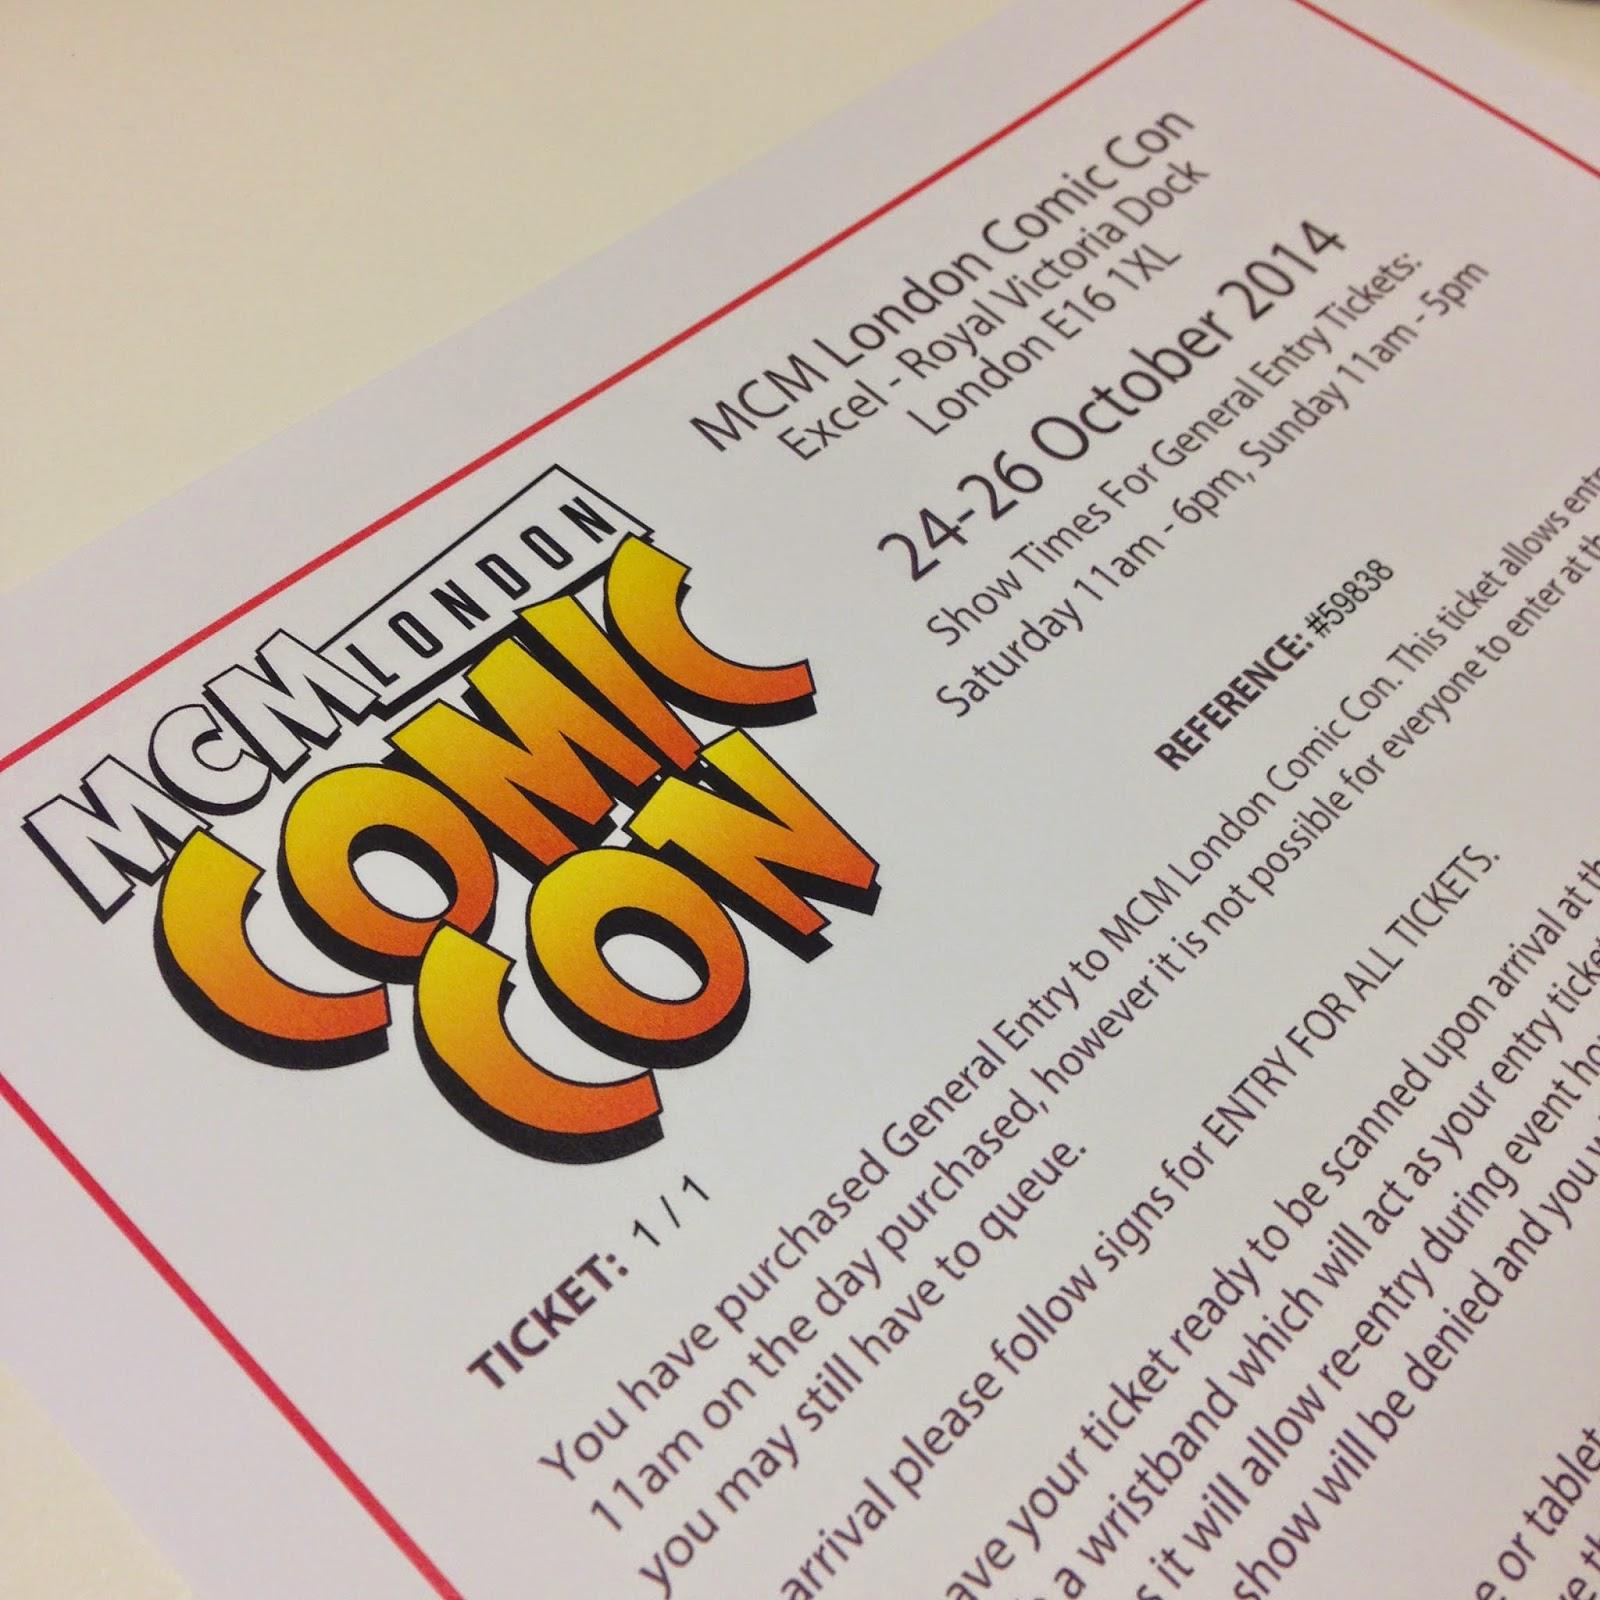 MCM London Comic Con 2014